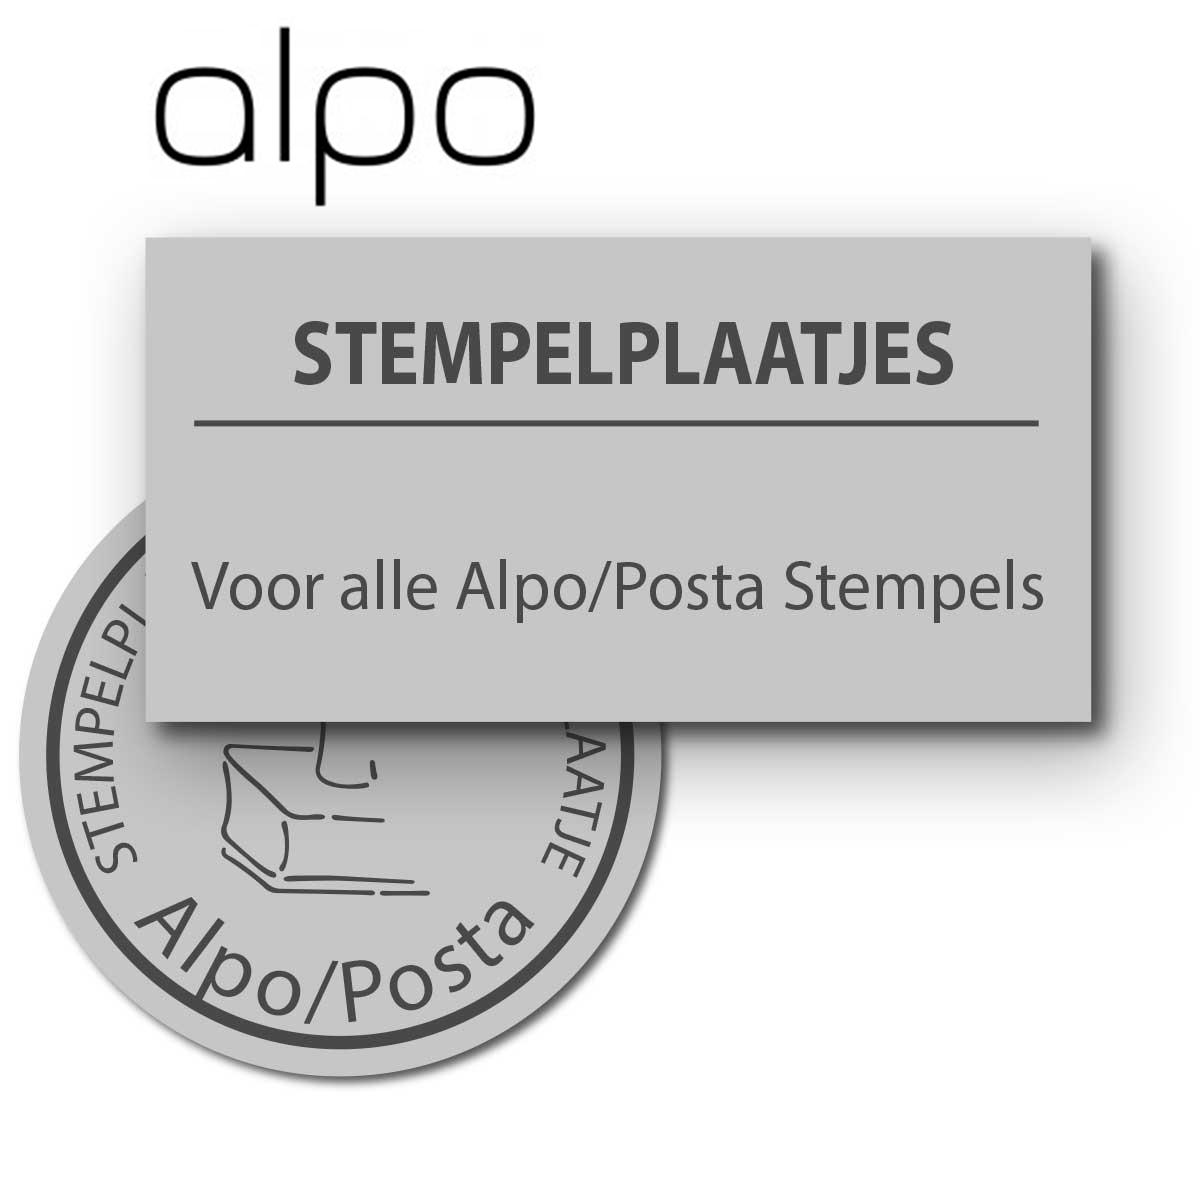 Alpo / Posta tekstplaatjes